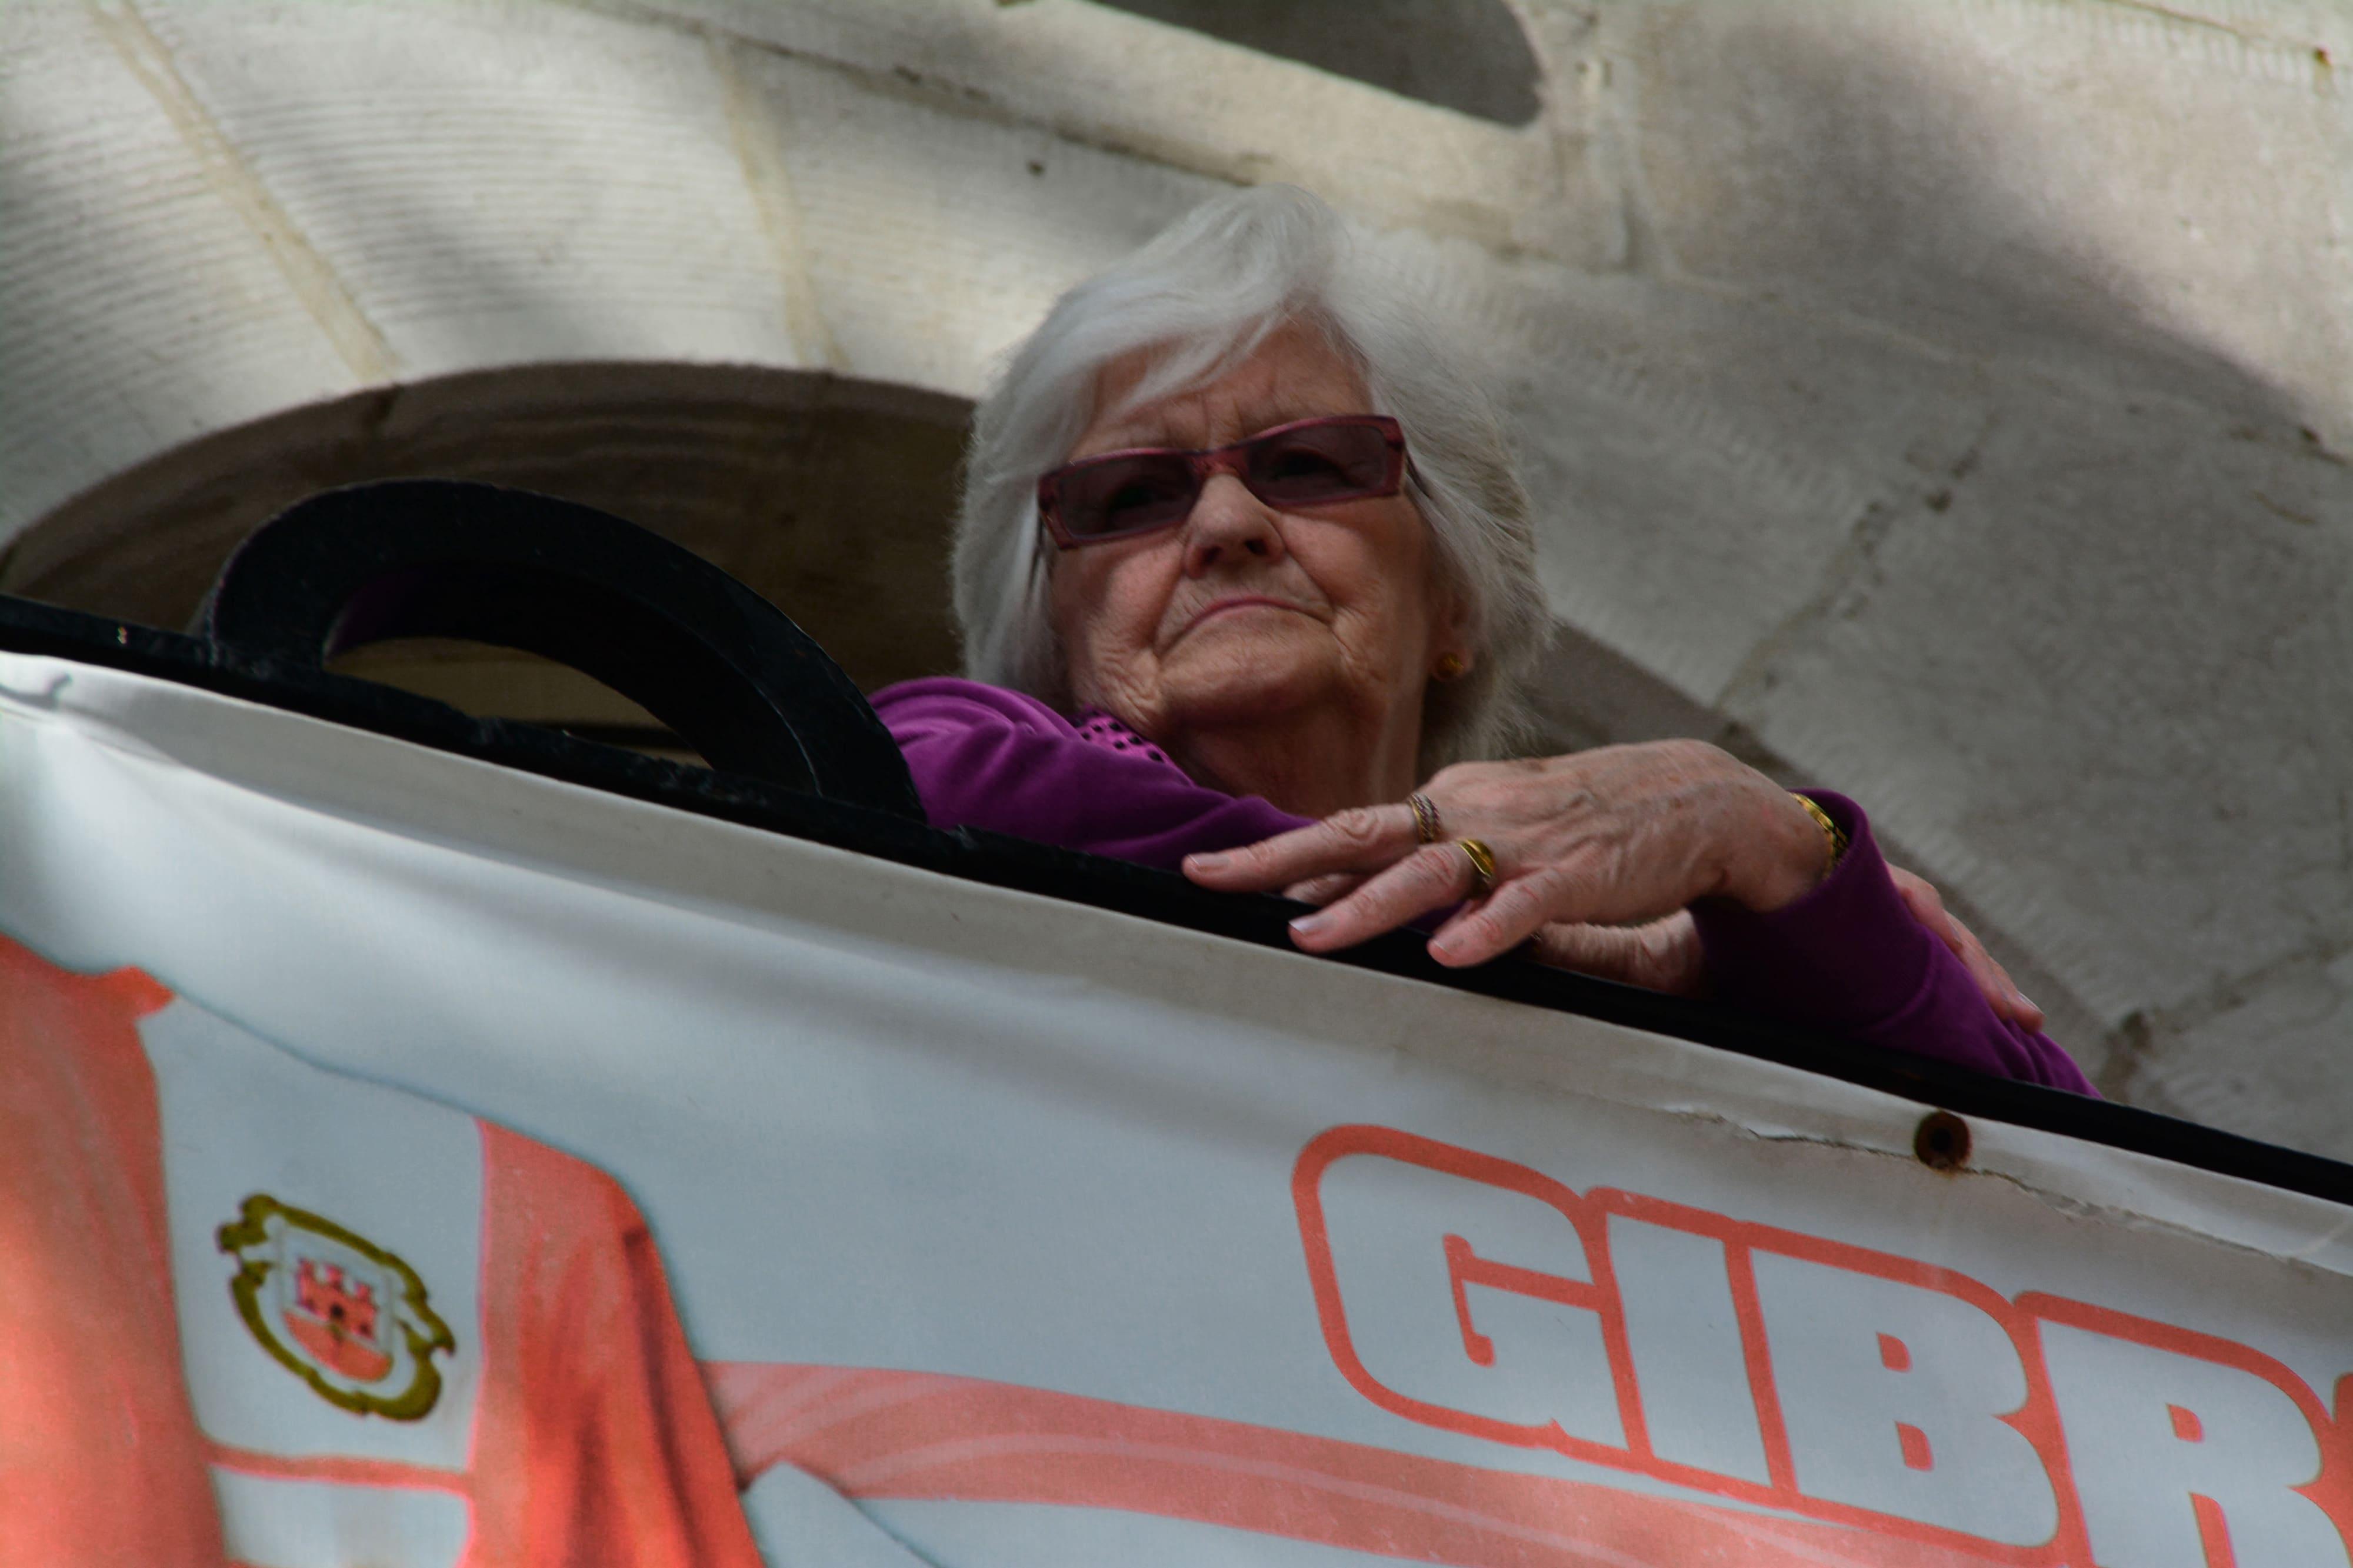 gibraltar-evacuation-dsc_3821_18005025501_o